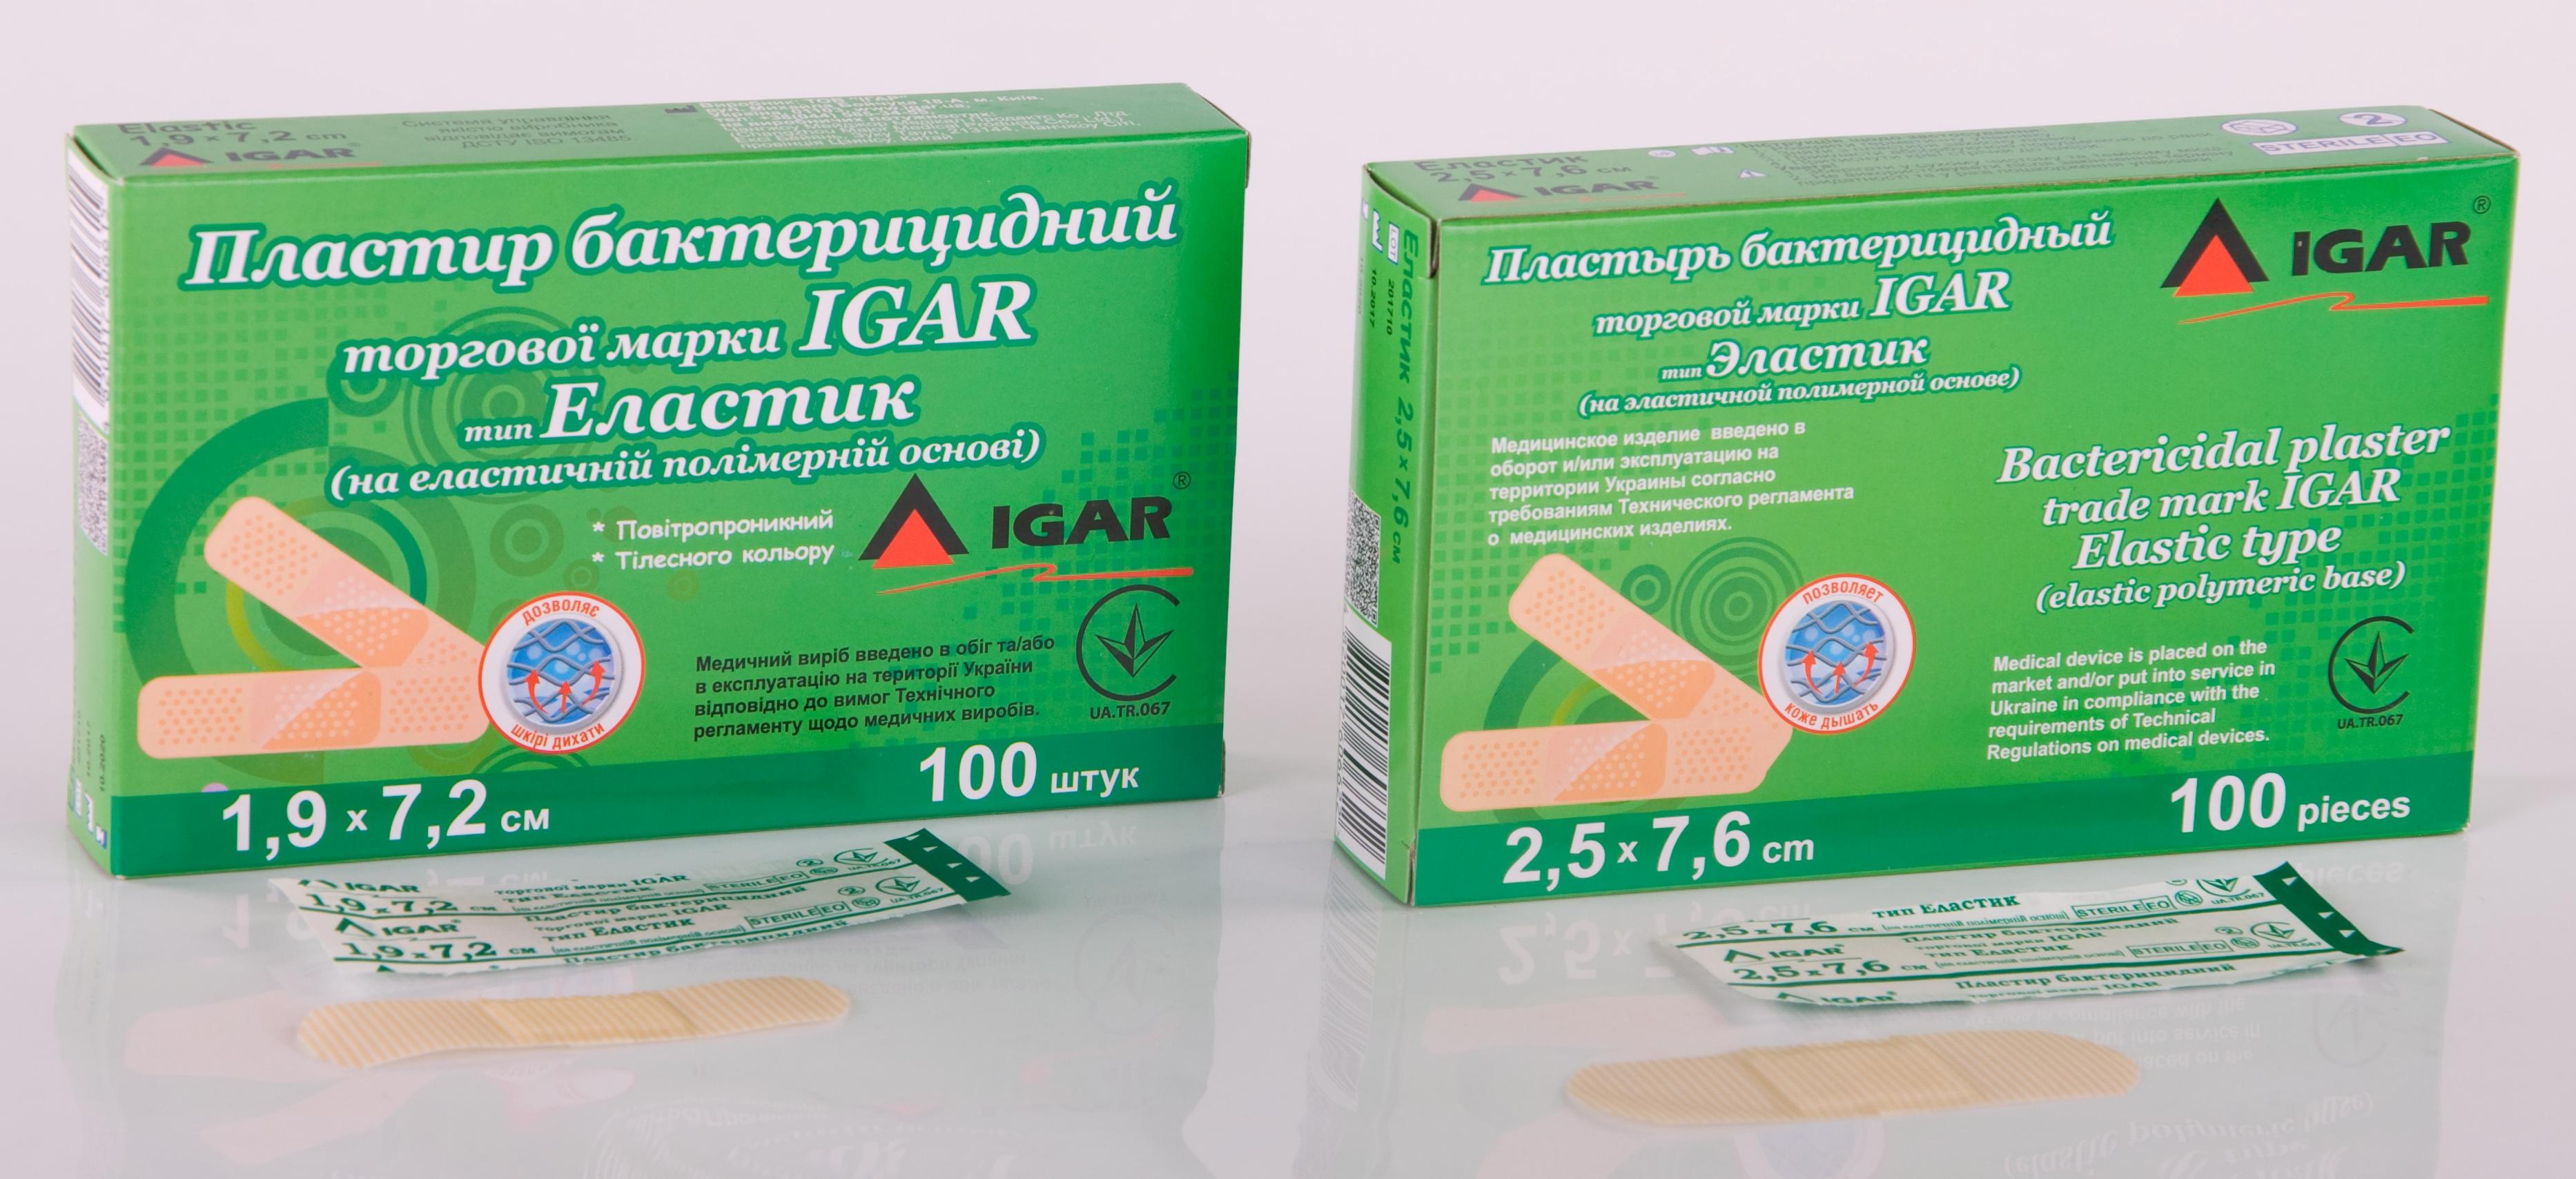 Bactericidal plaster trade mark IGAR Elastic type (elastic polymeric base)